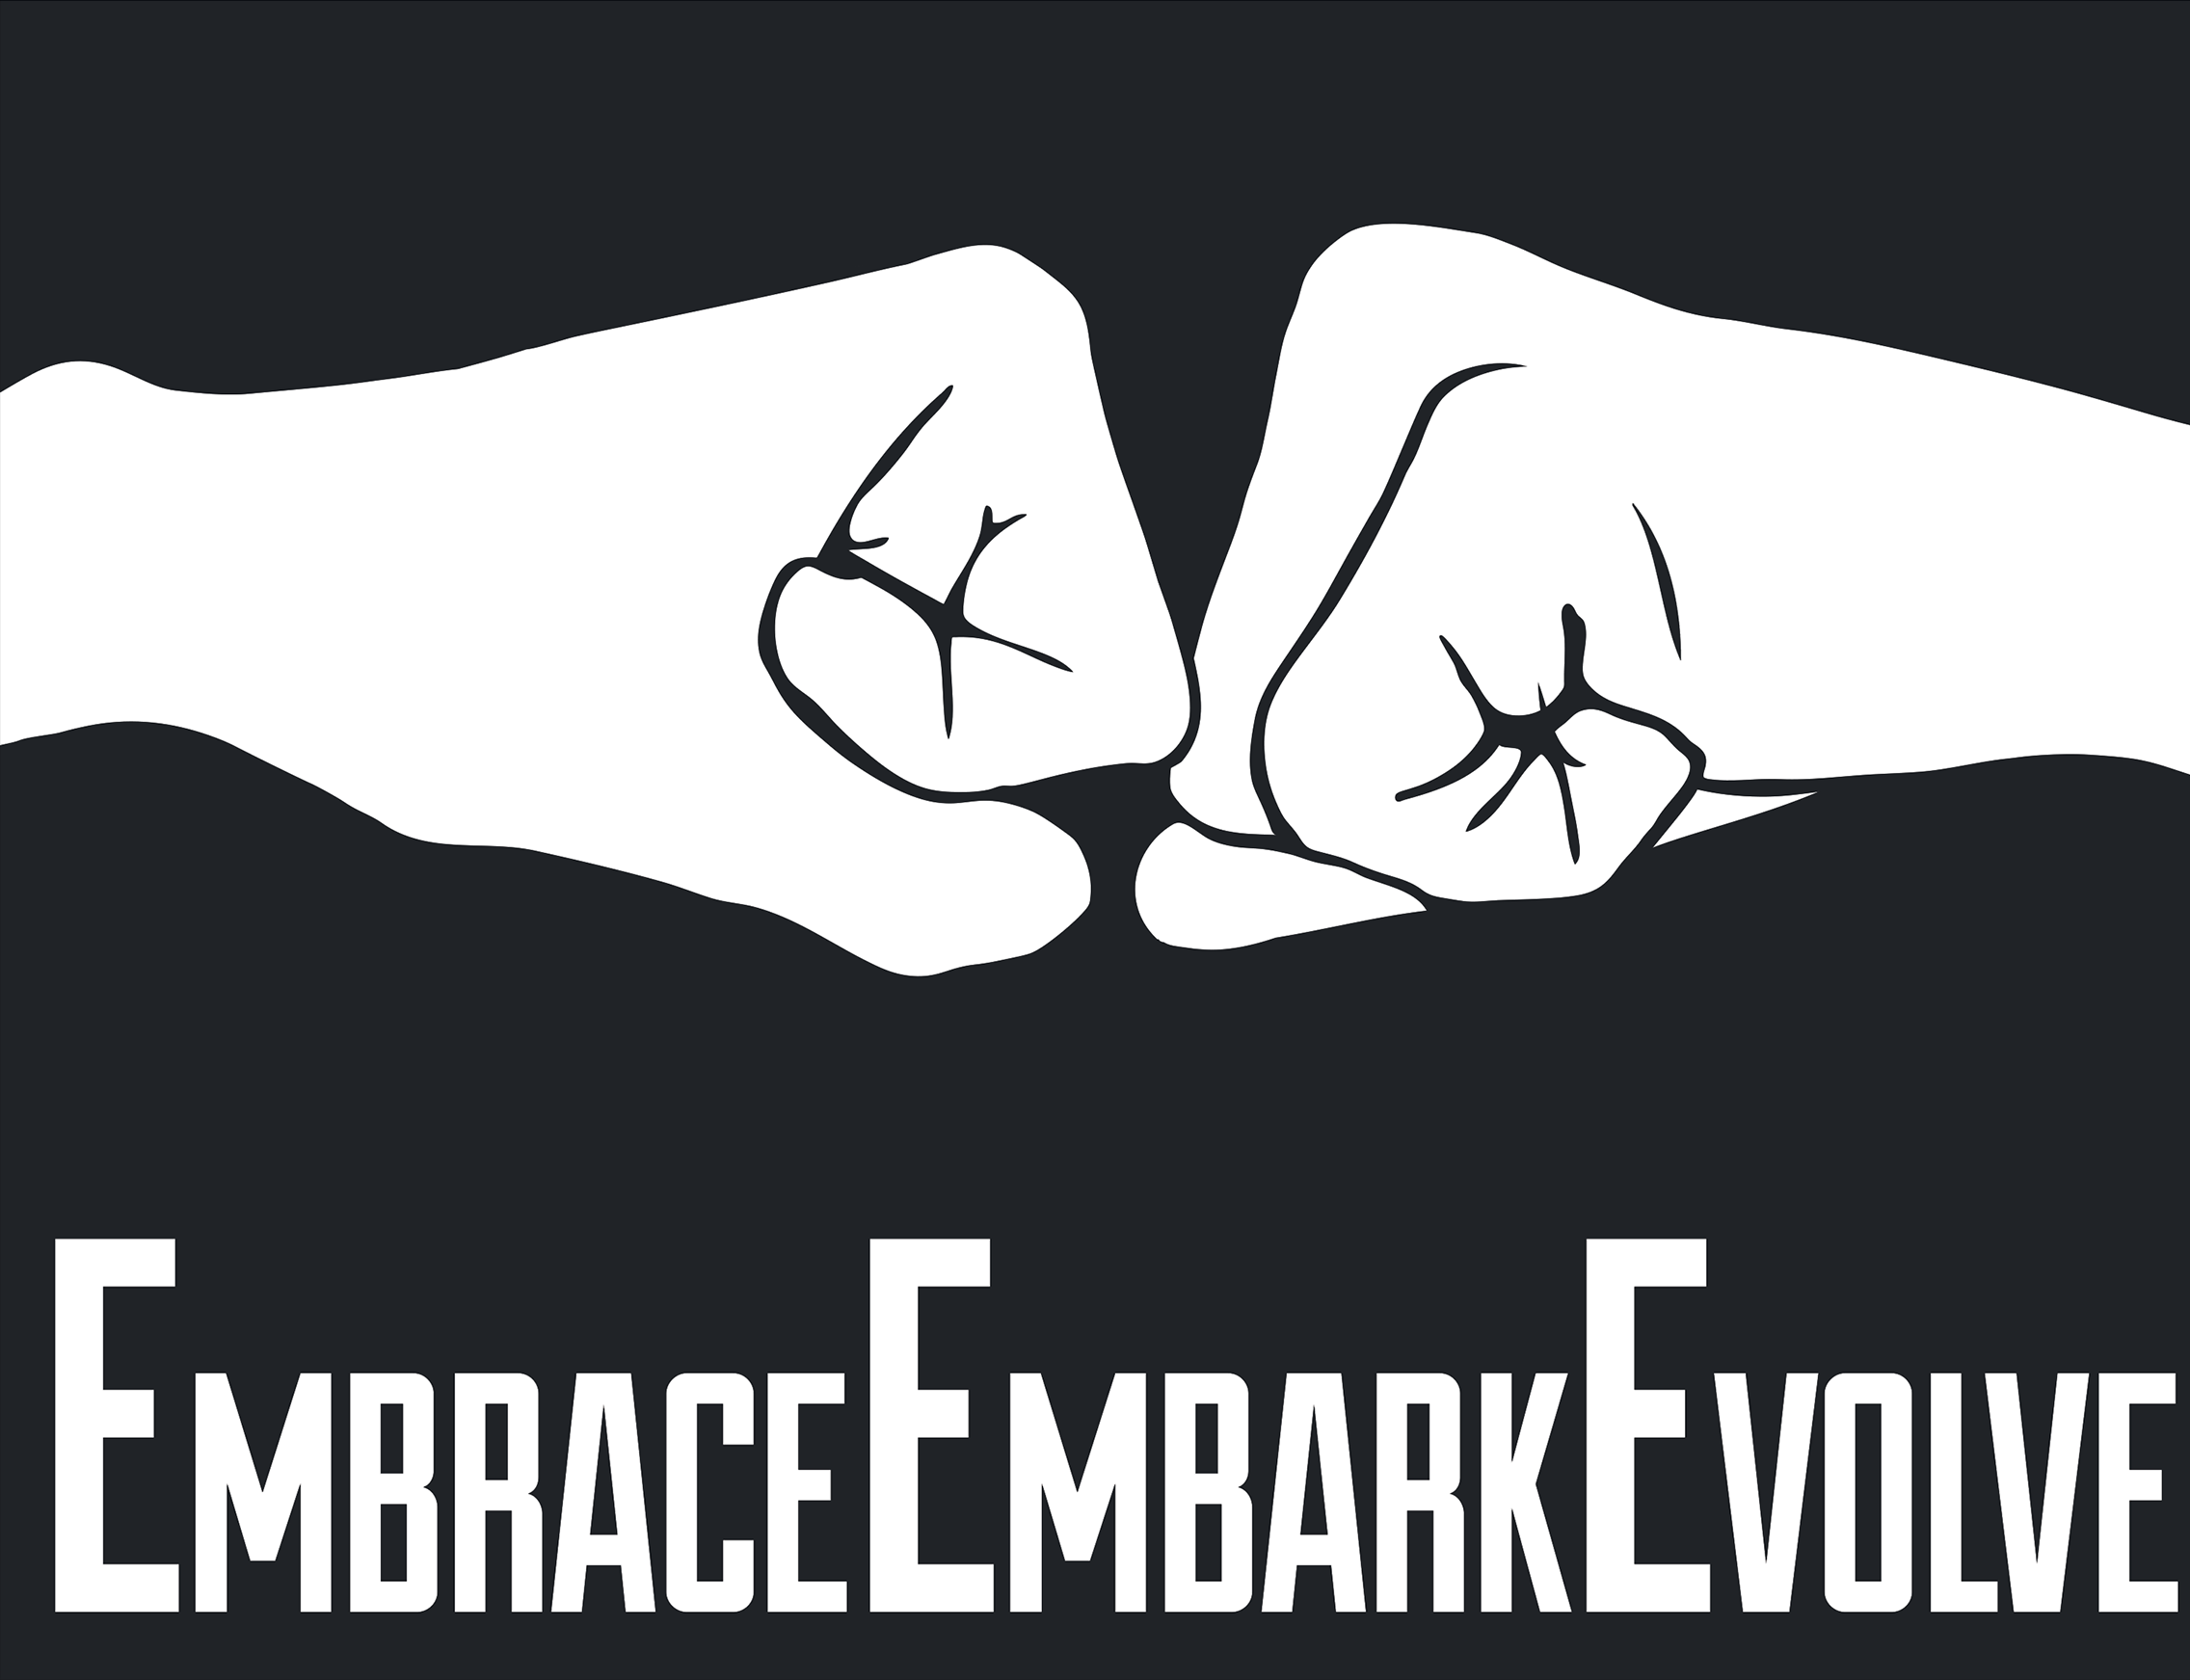 EmbraceEmbarkEvolve fist bump logo